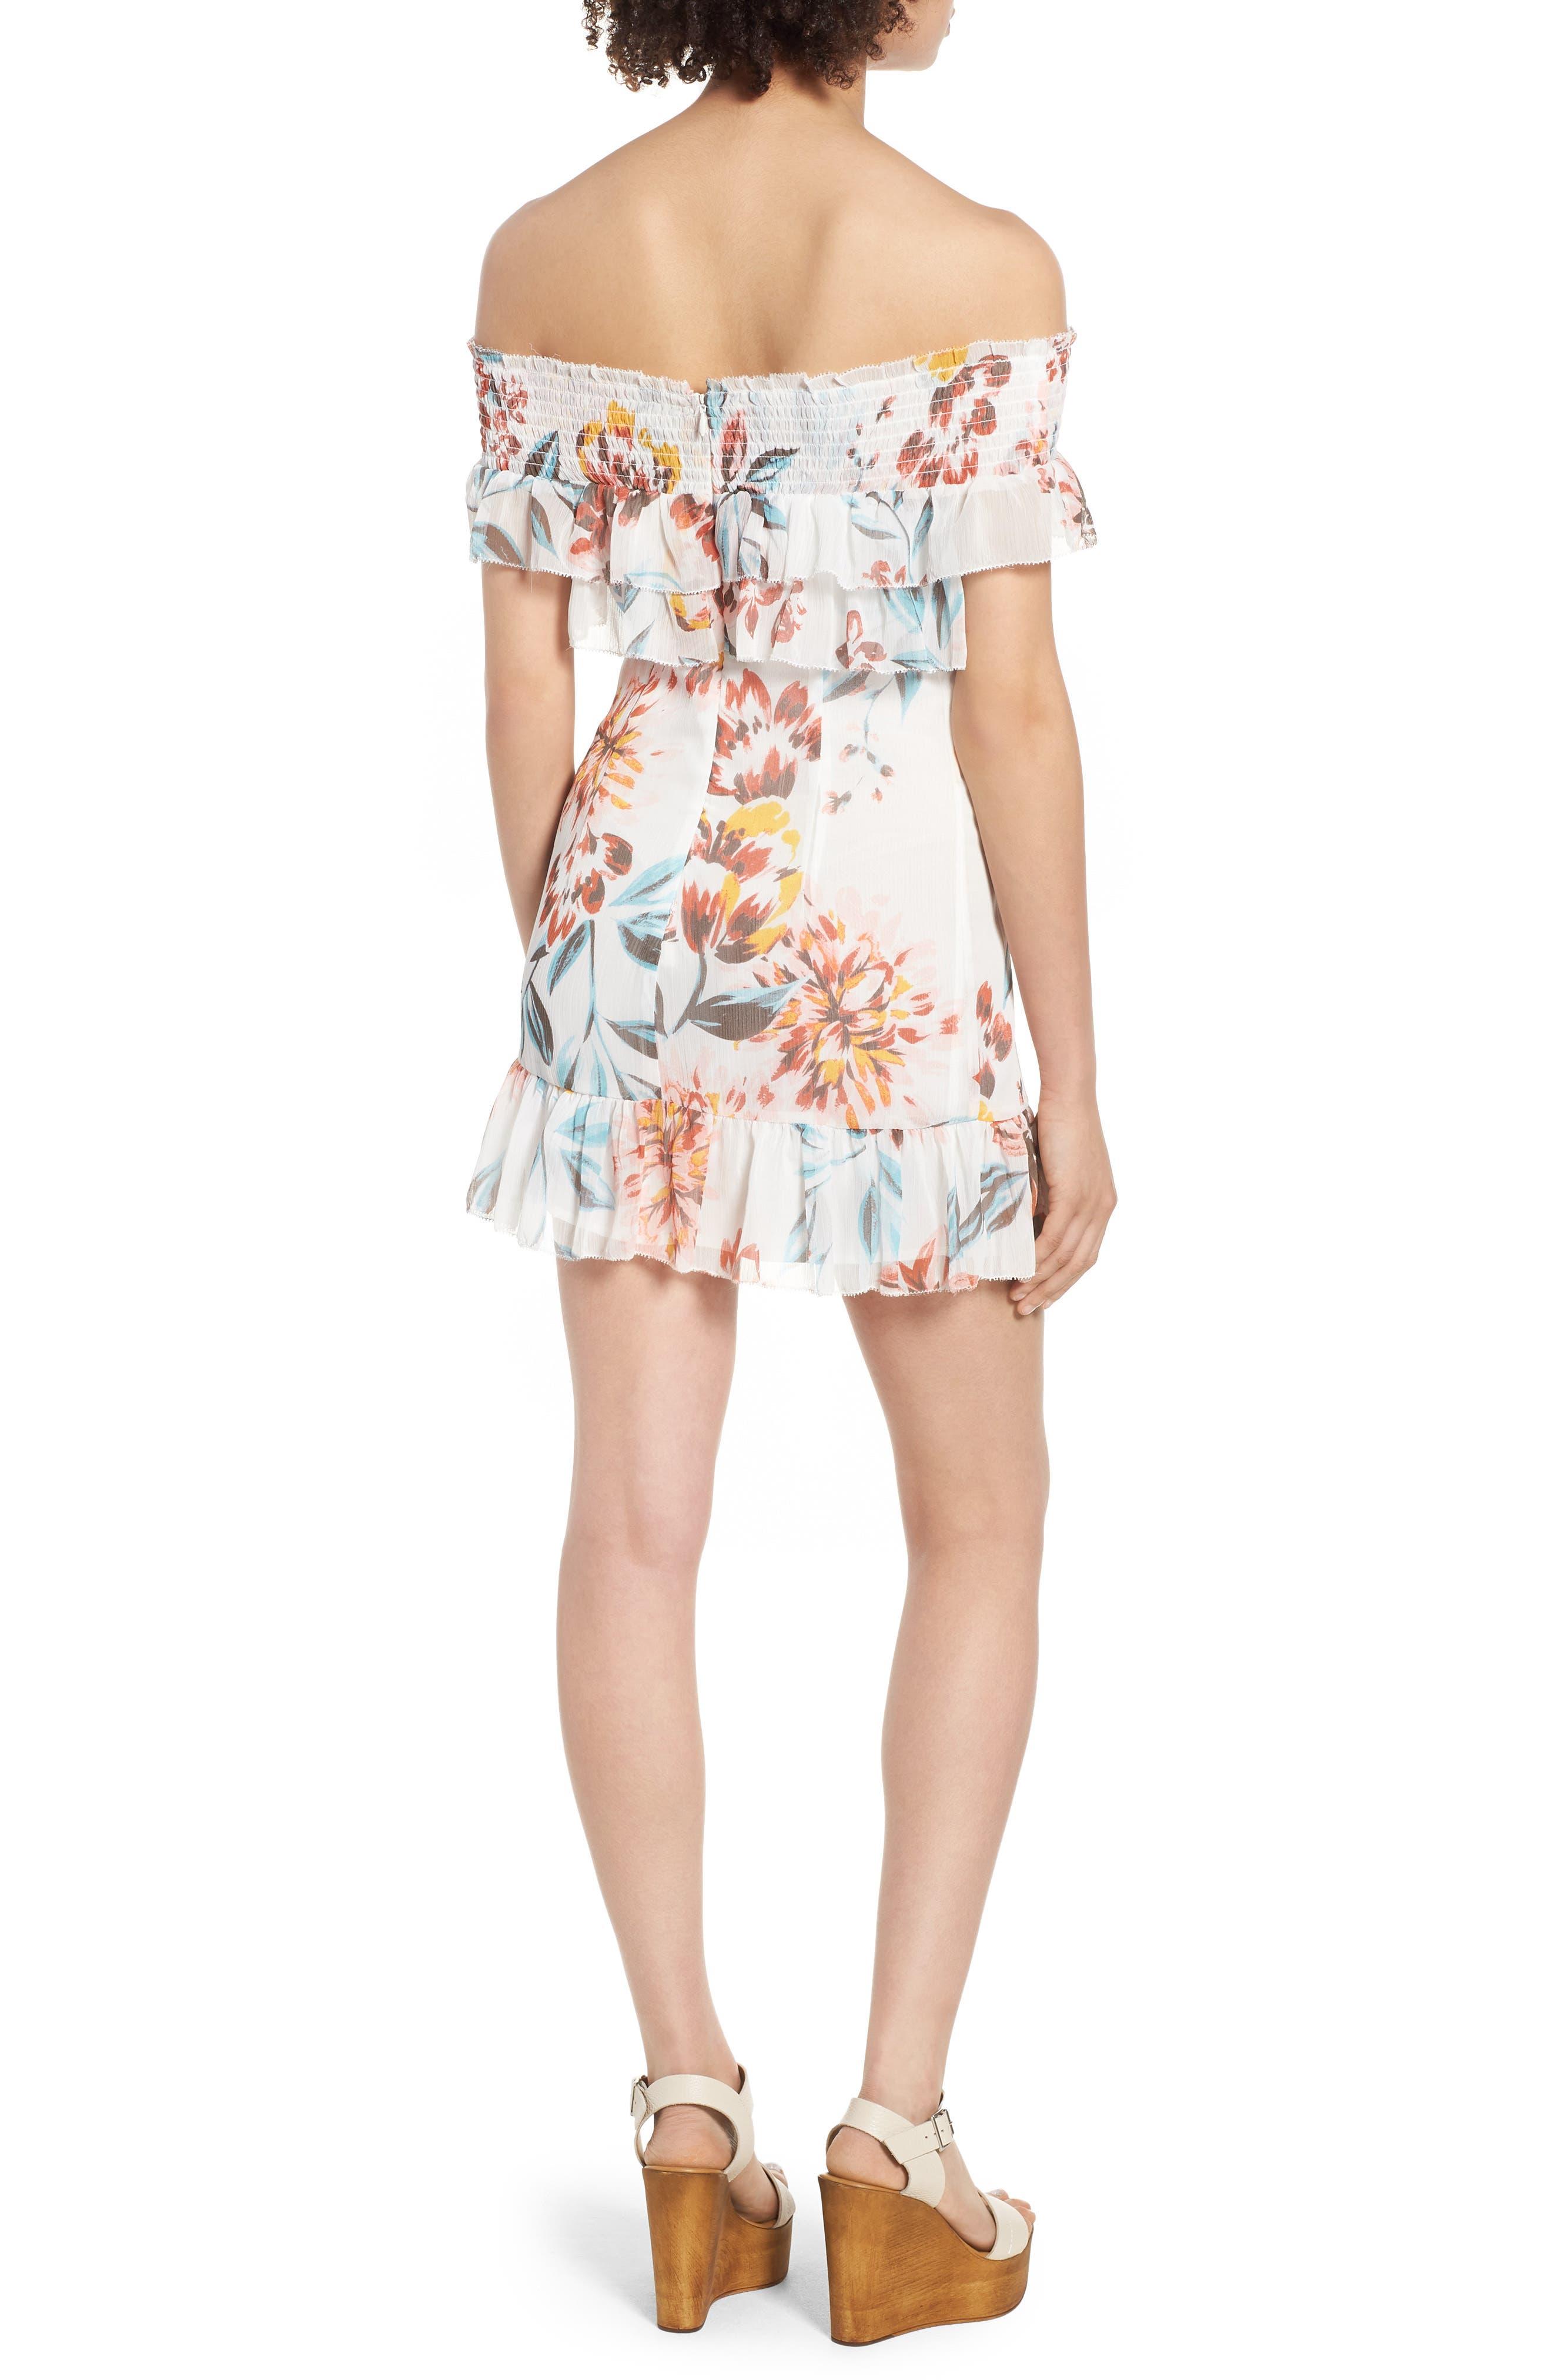 Lanzo Off the Shoulder Dress,                             Alternate thumbnail 2, color,                             Dahlia Floral